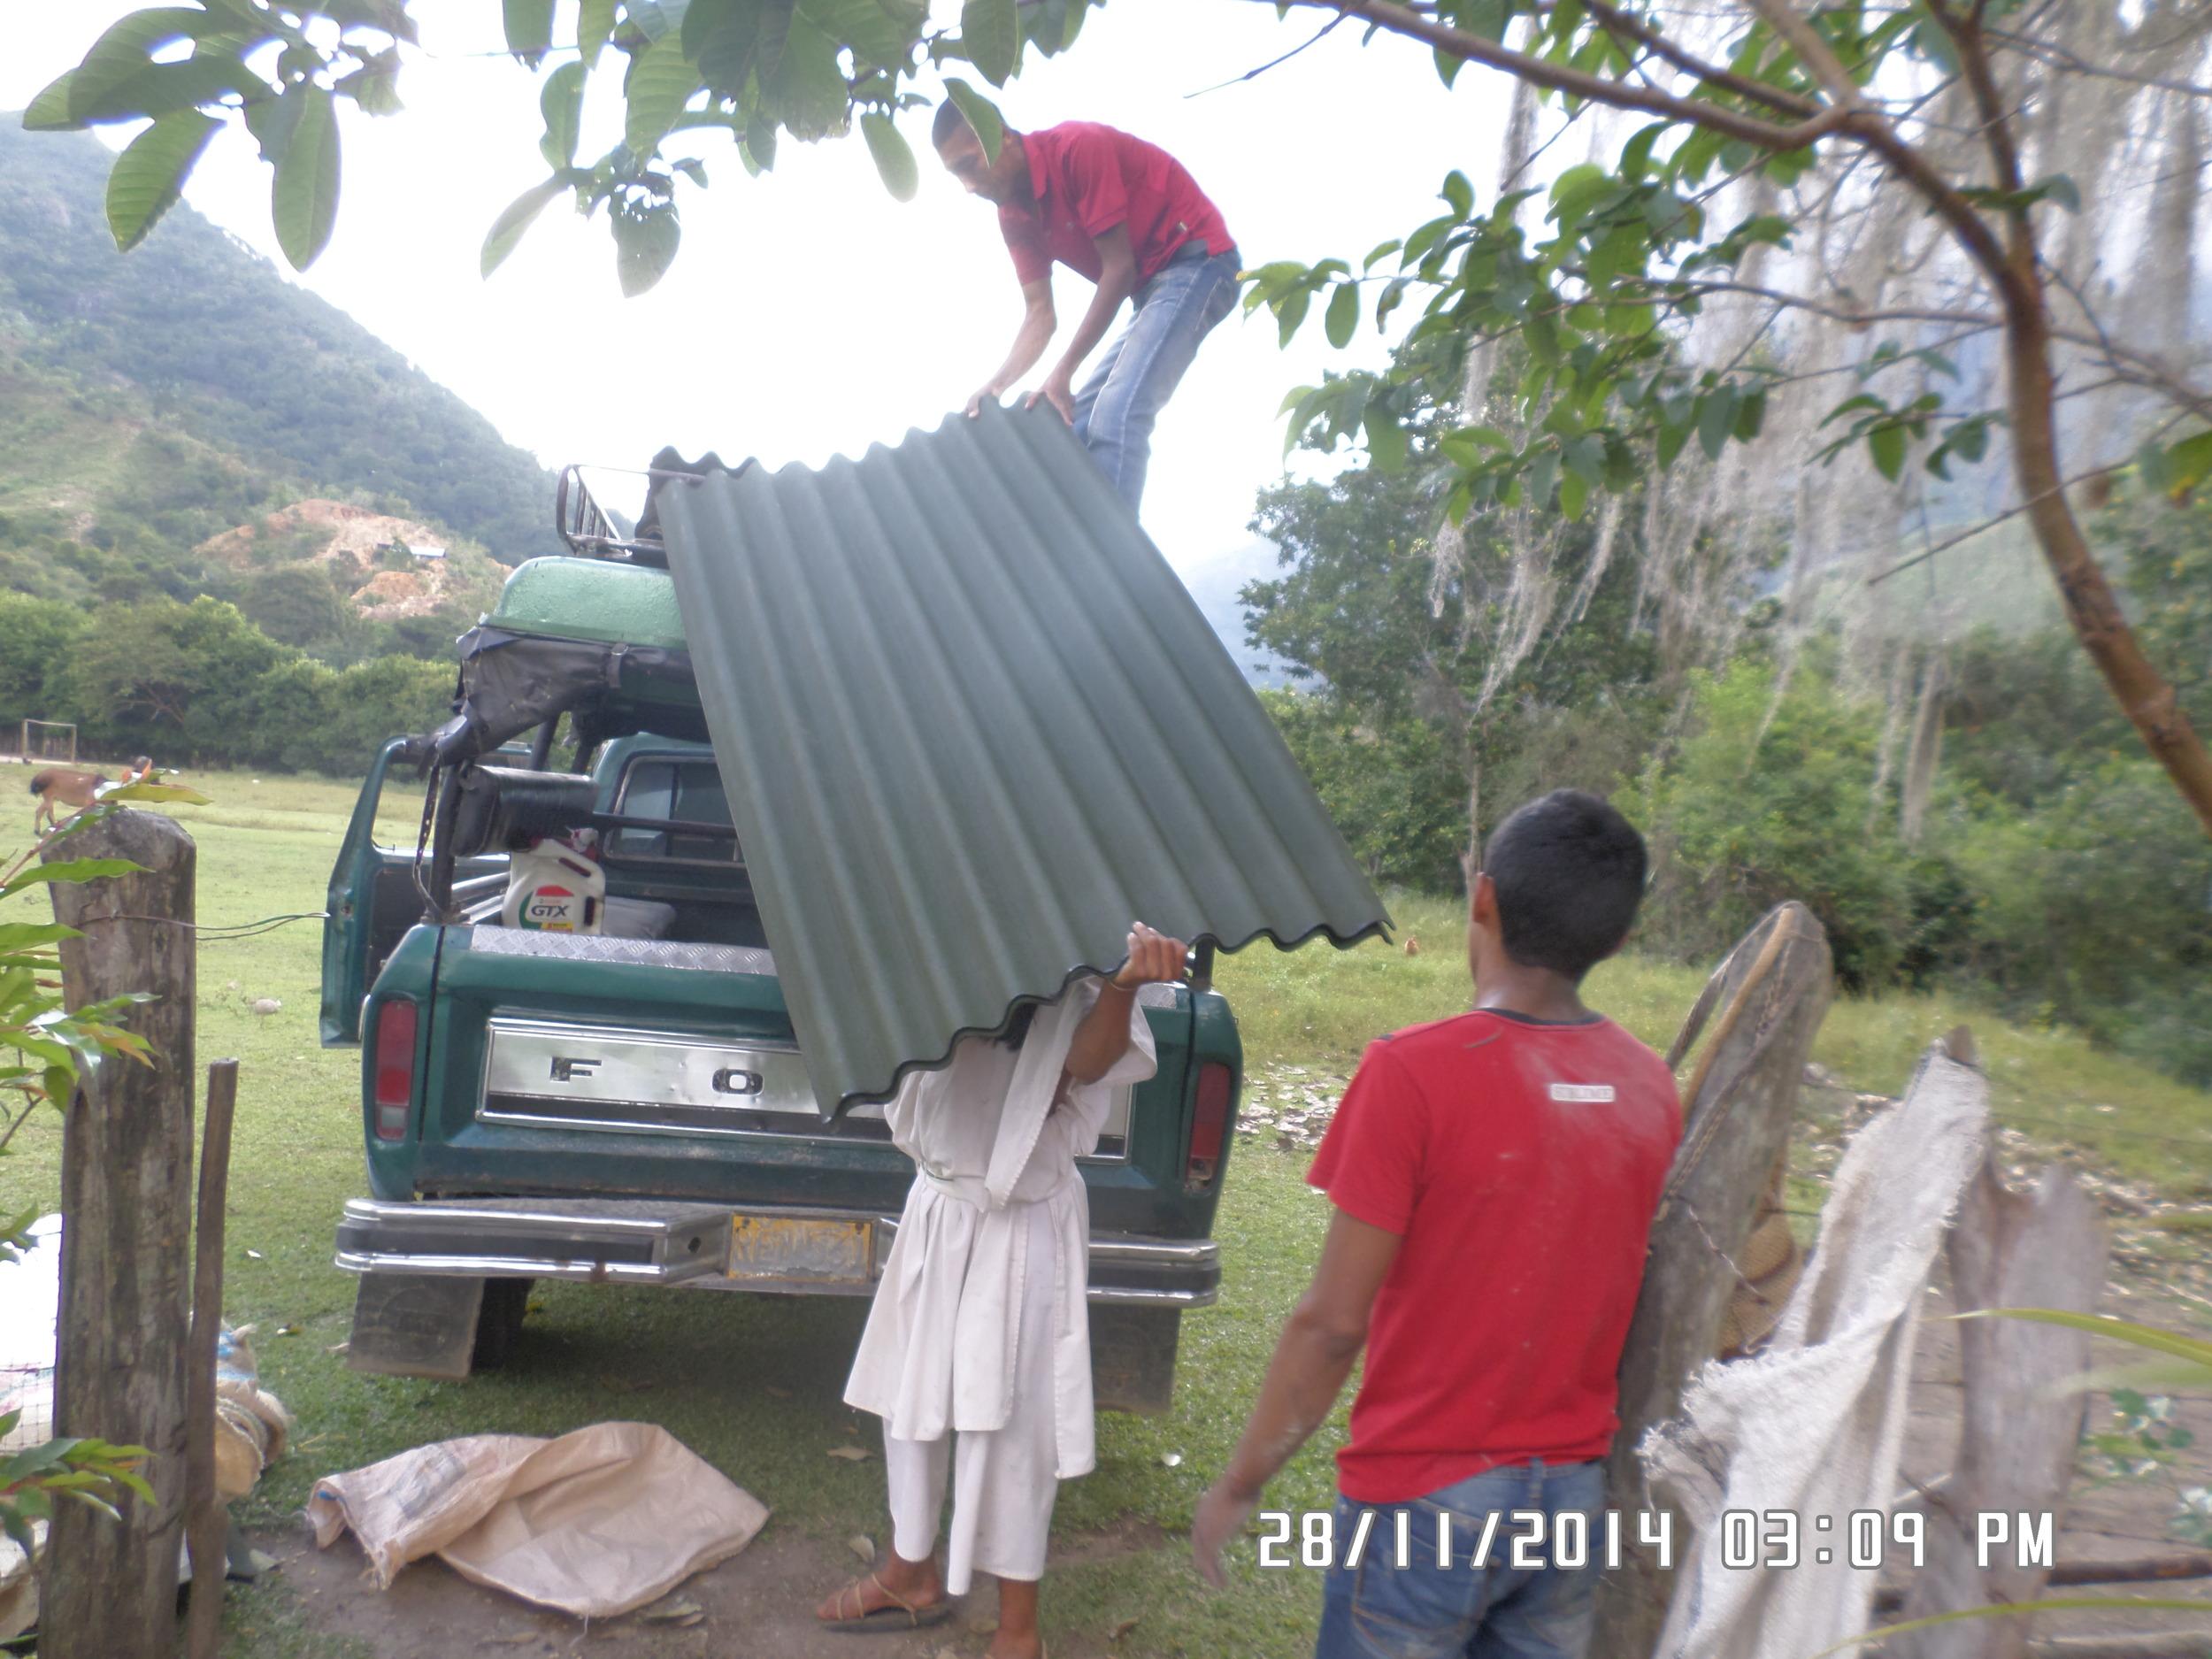 Downloading the materials at Sabana Crespo